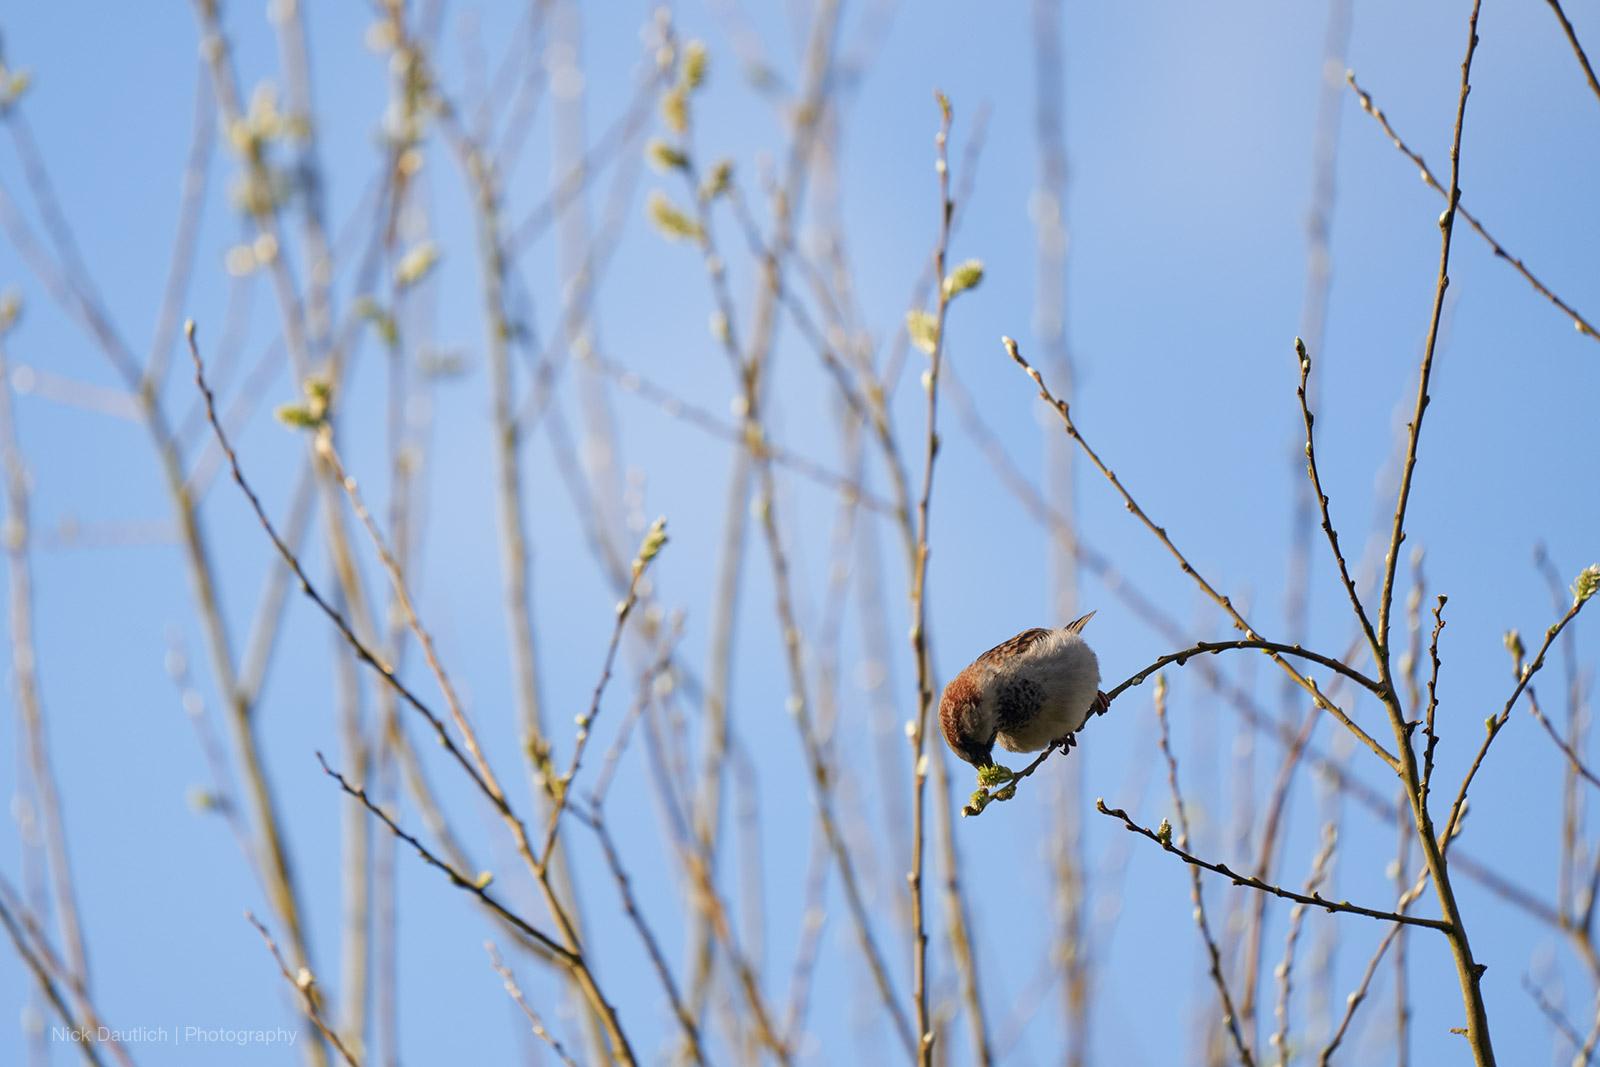 Bird breakfasting